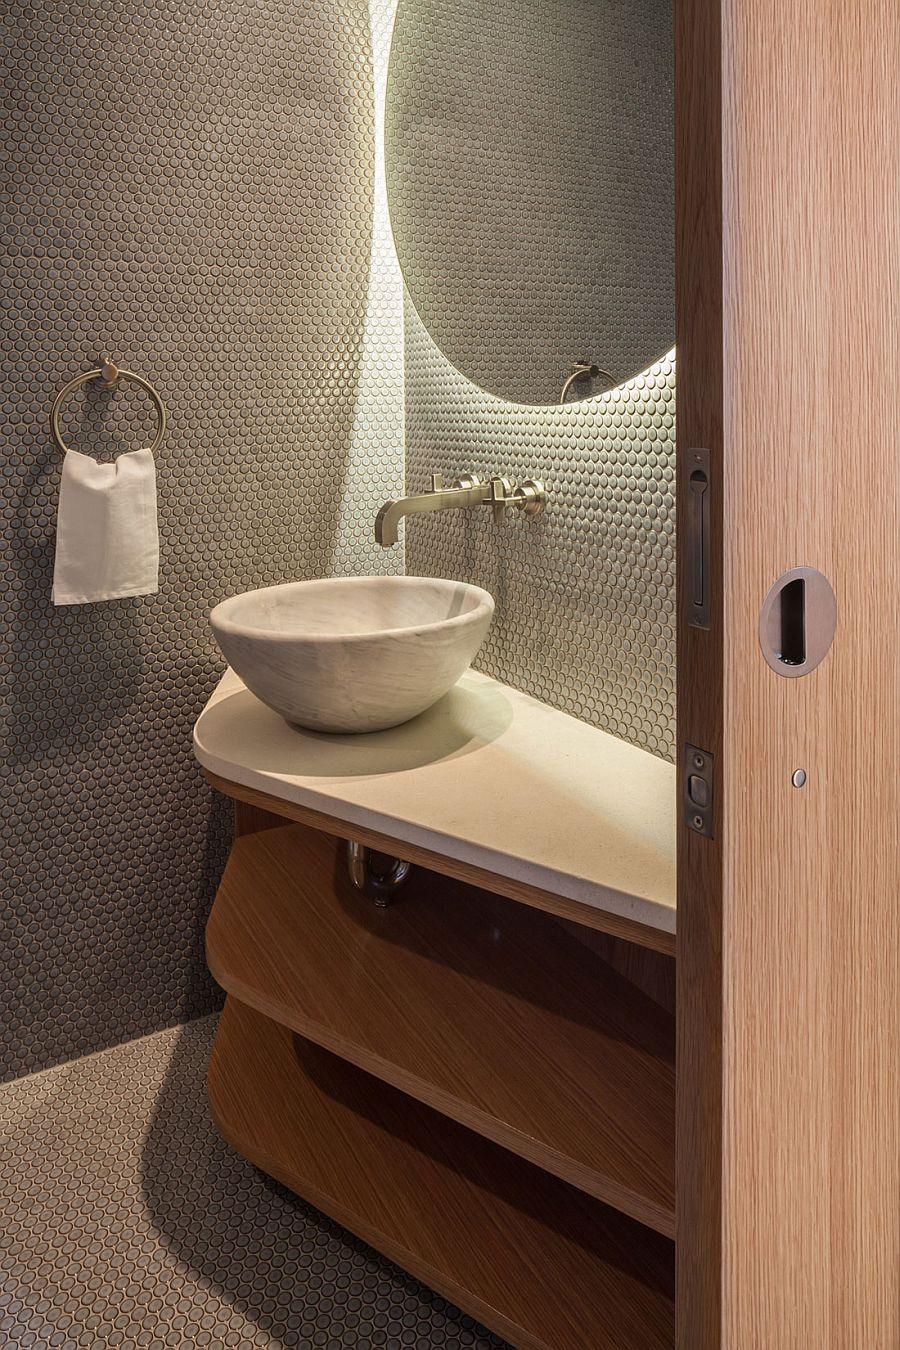 Penny tiles create a unique backdrop in the bathroom